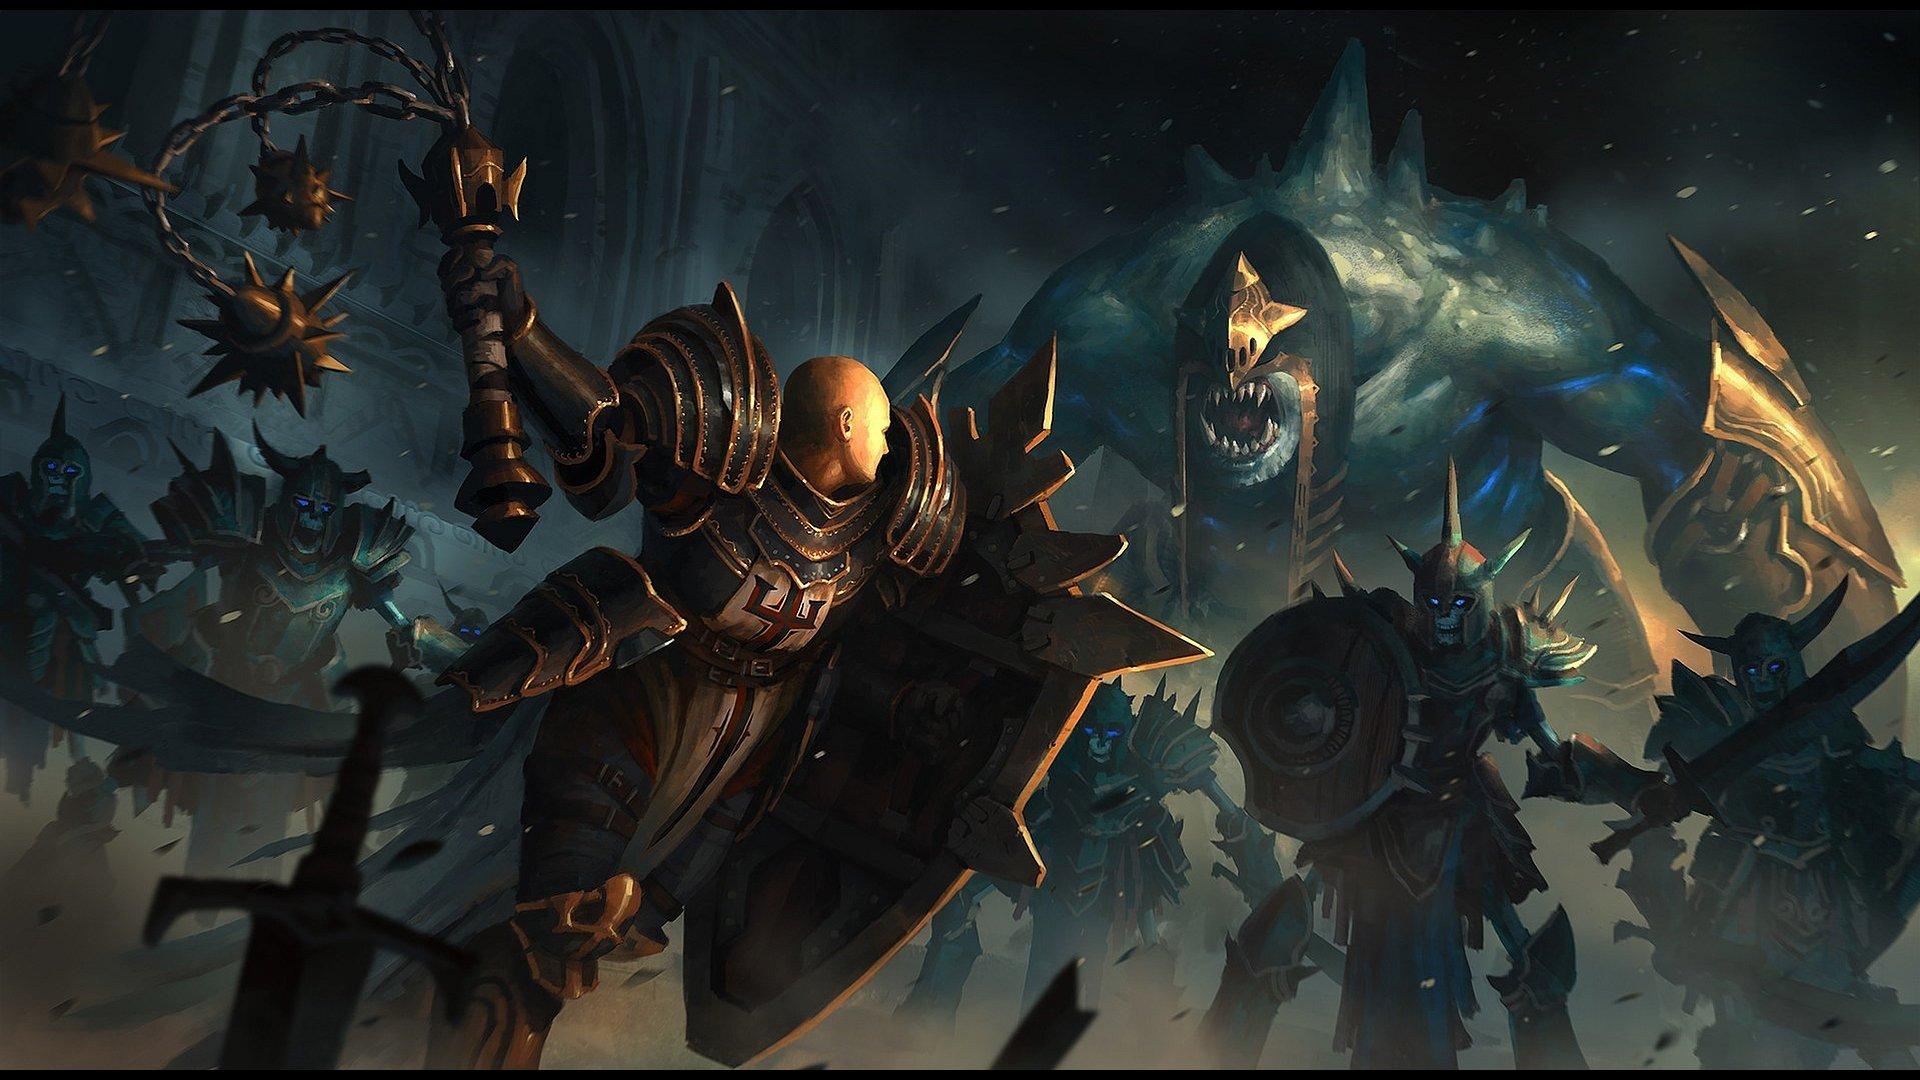 Crusader Diablo 3 Wallpapers 1920x1080 Full Hd 1080p Desktop Backgrounds